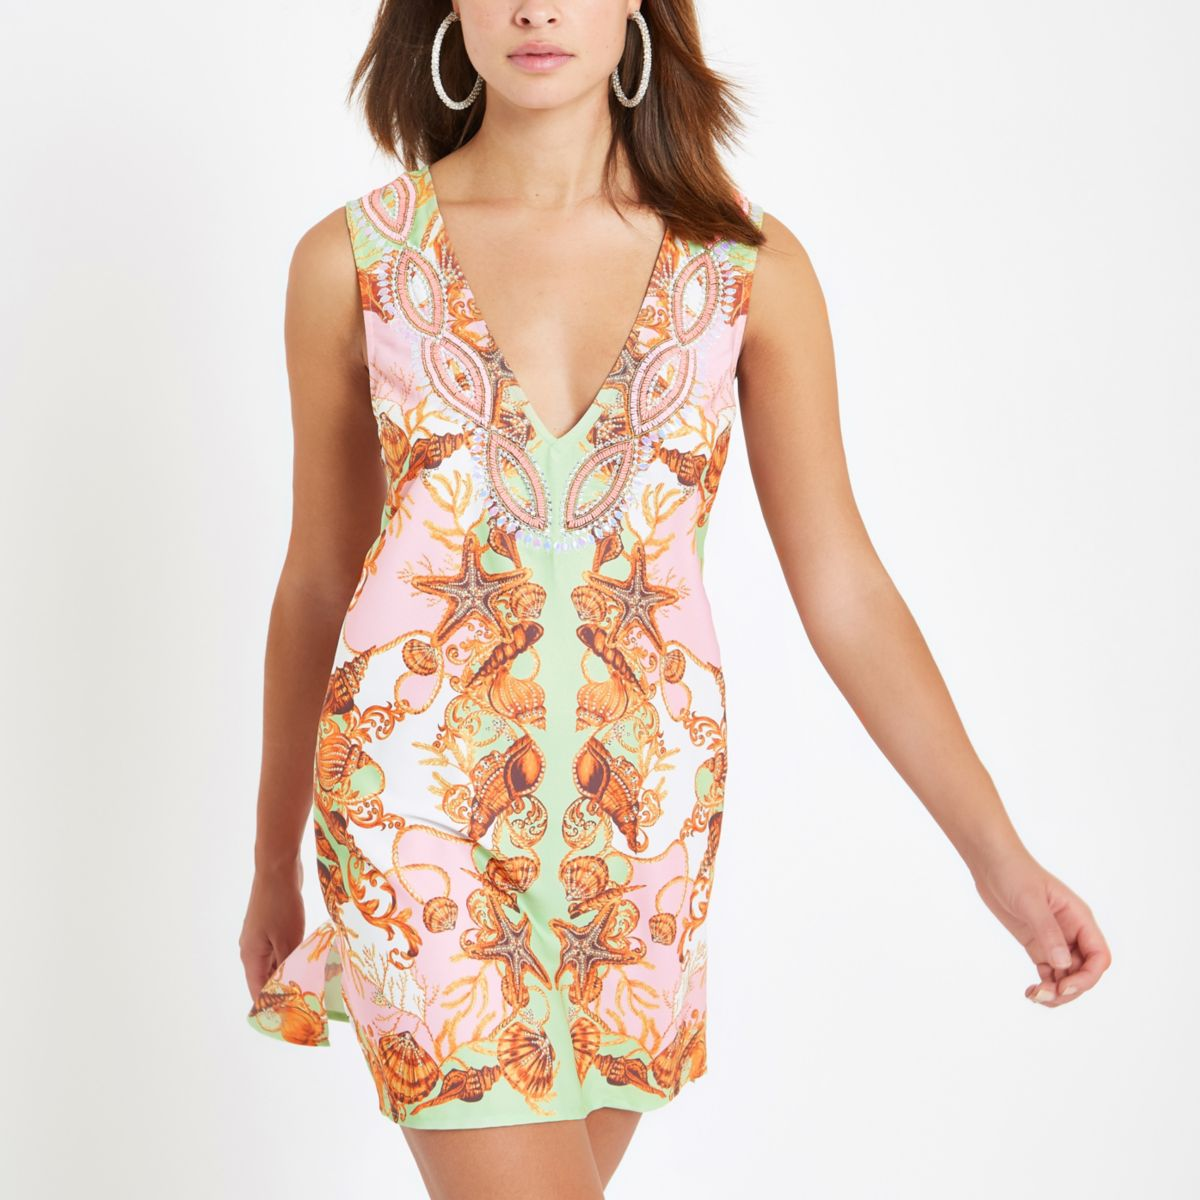 Pink diamante embellished beach dress